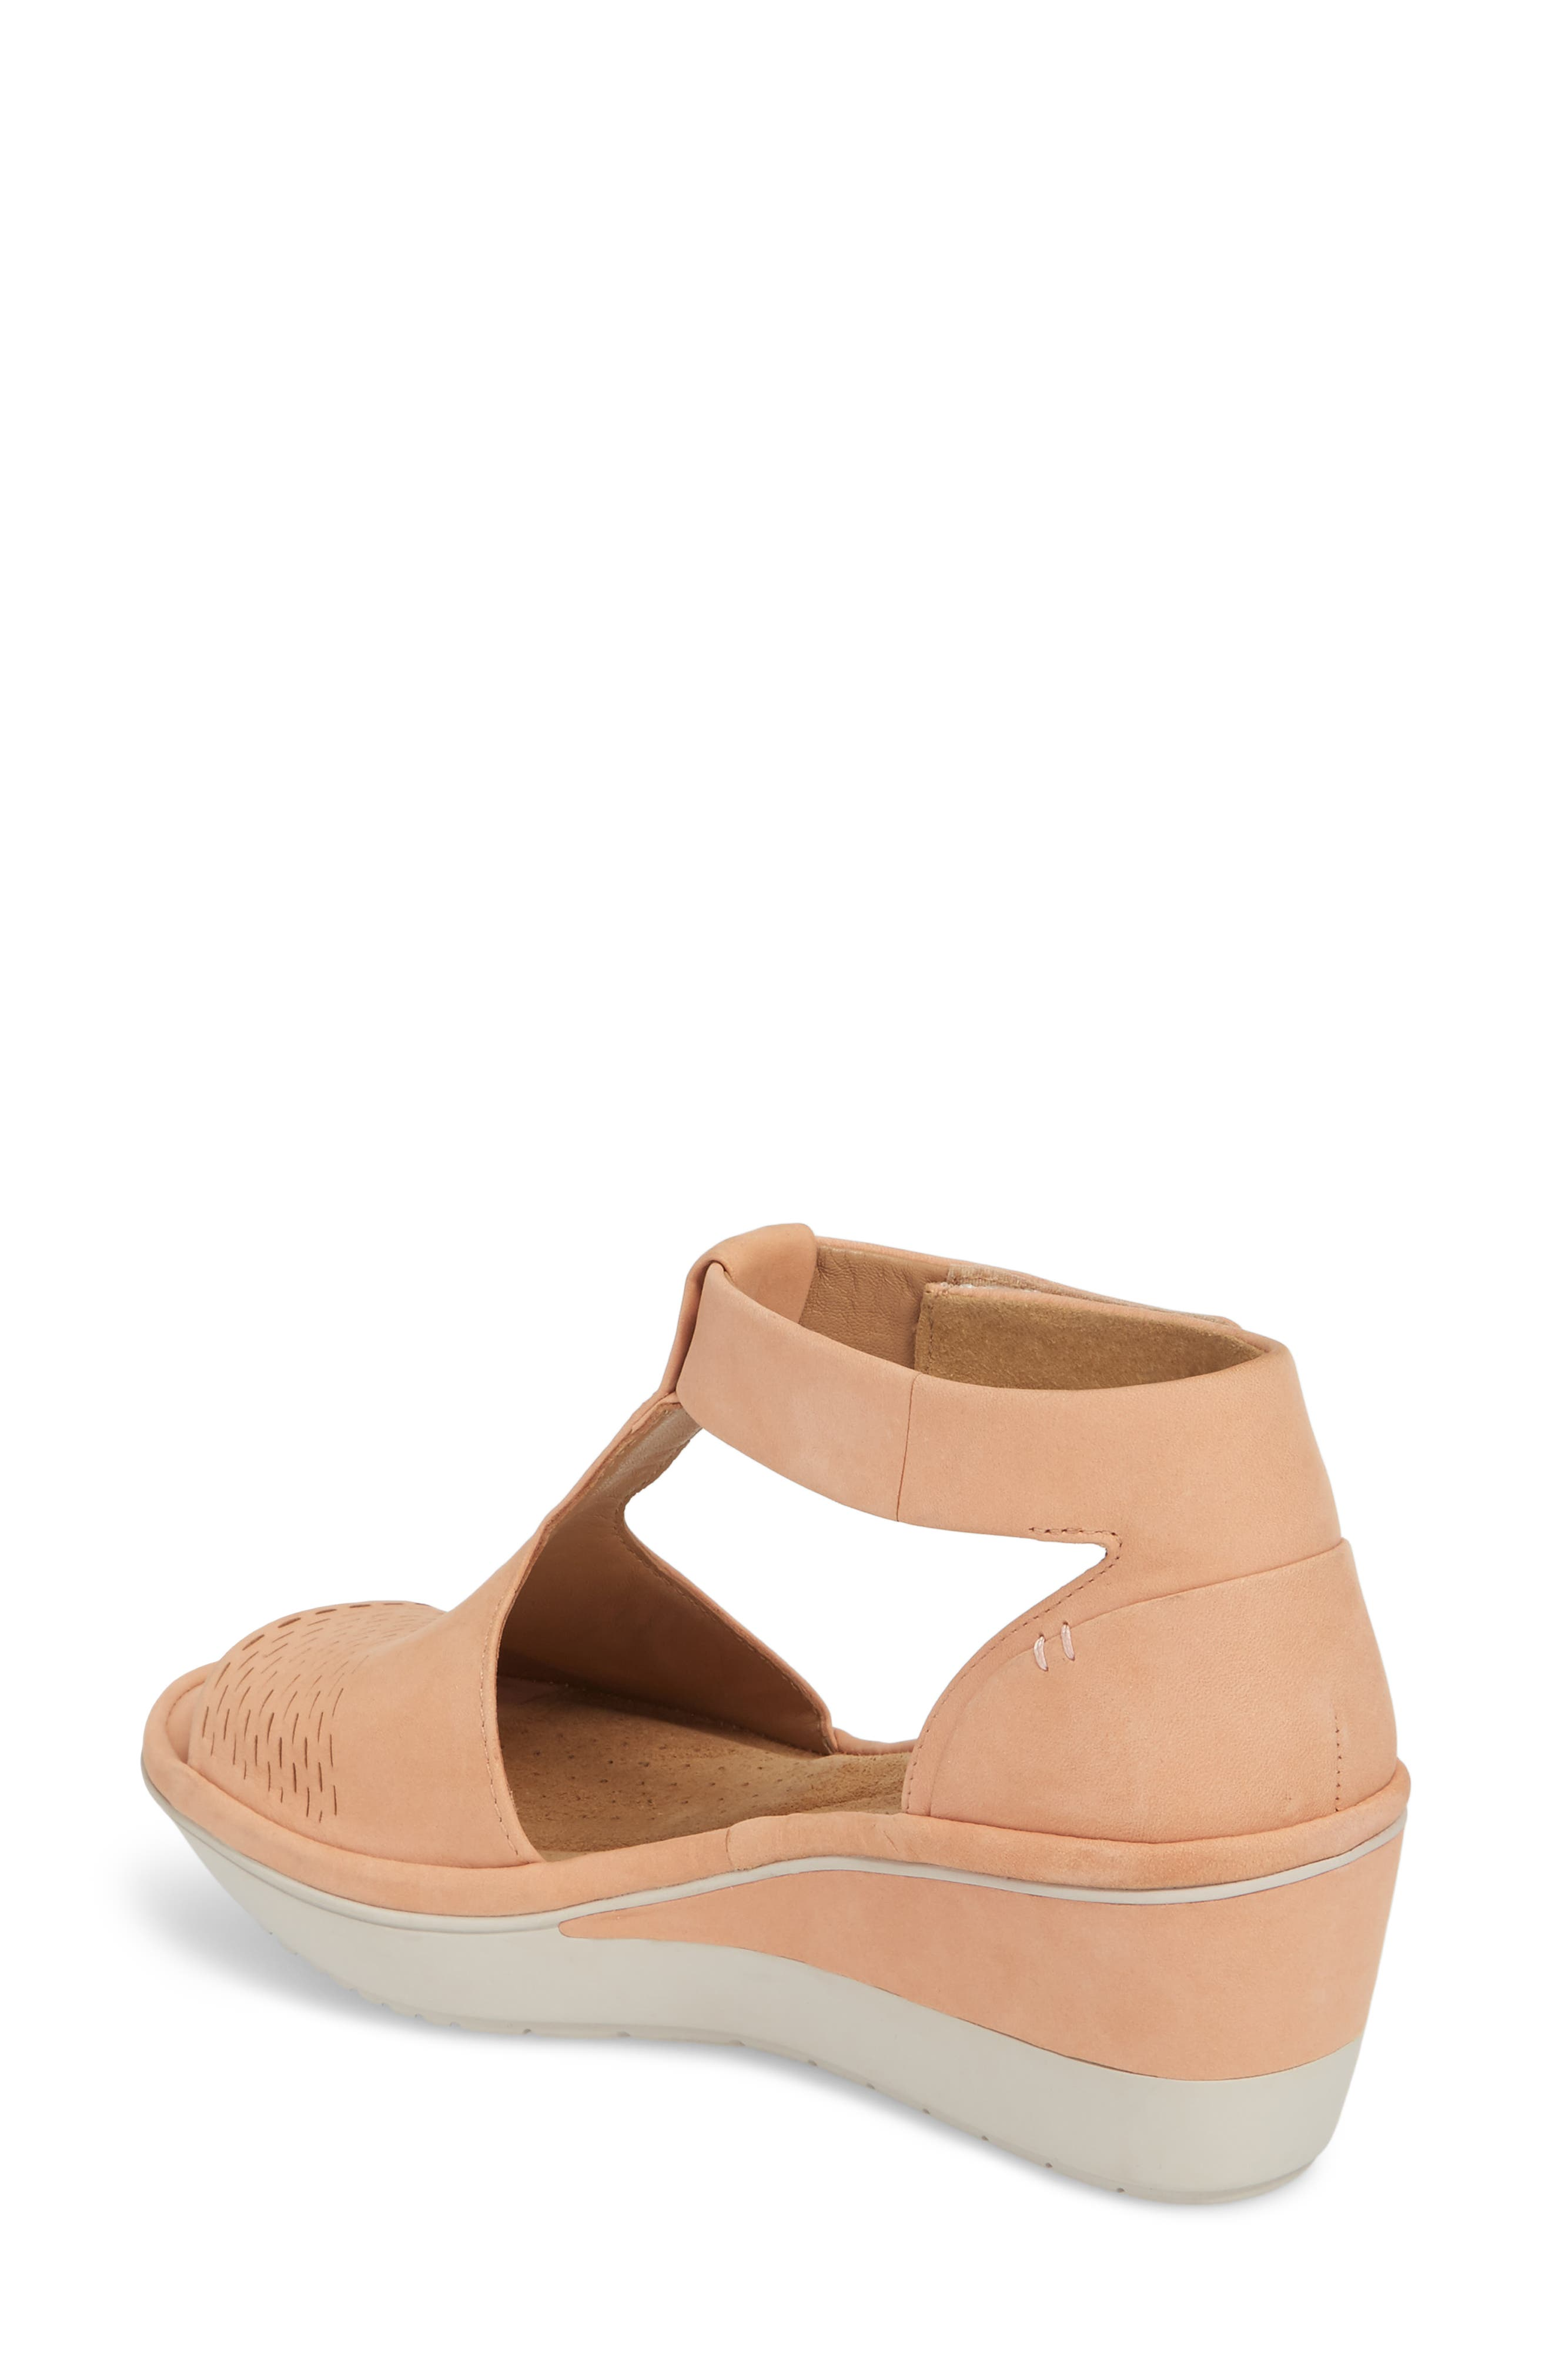 Wynnmere Avah T-Strap Wedge Sandal,                             Alternate thumbnail 2, color,                             Peach Nubuck